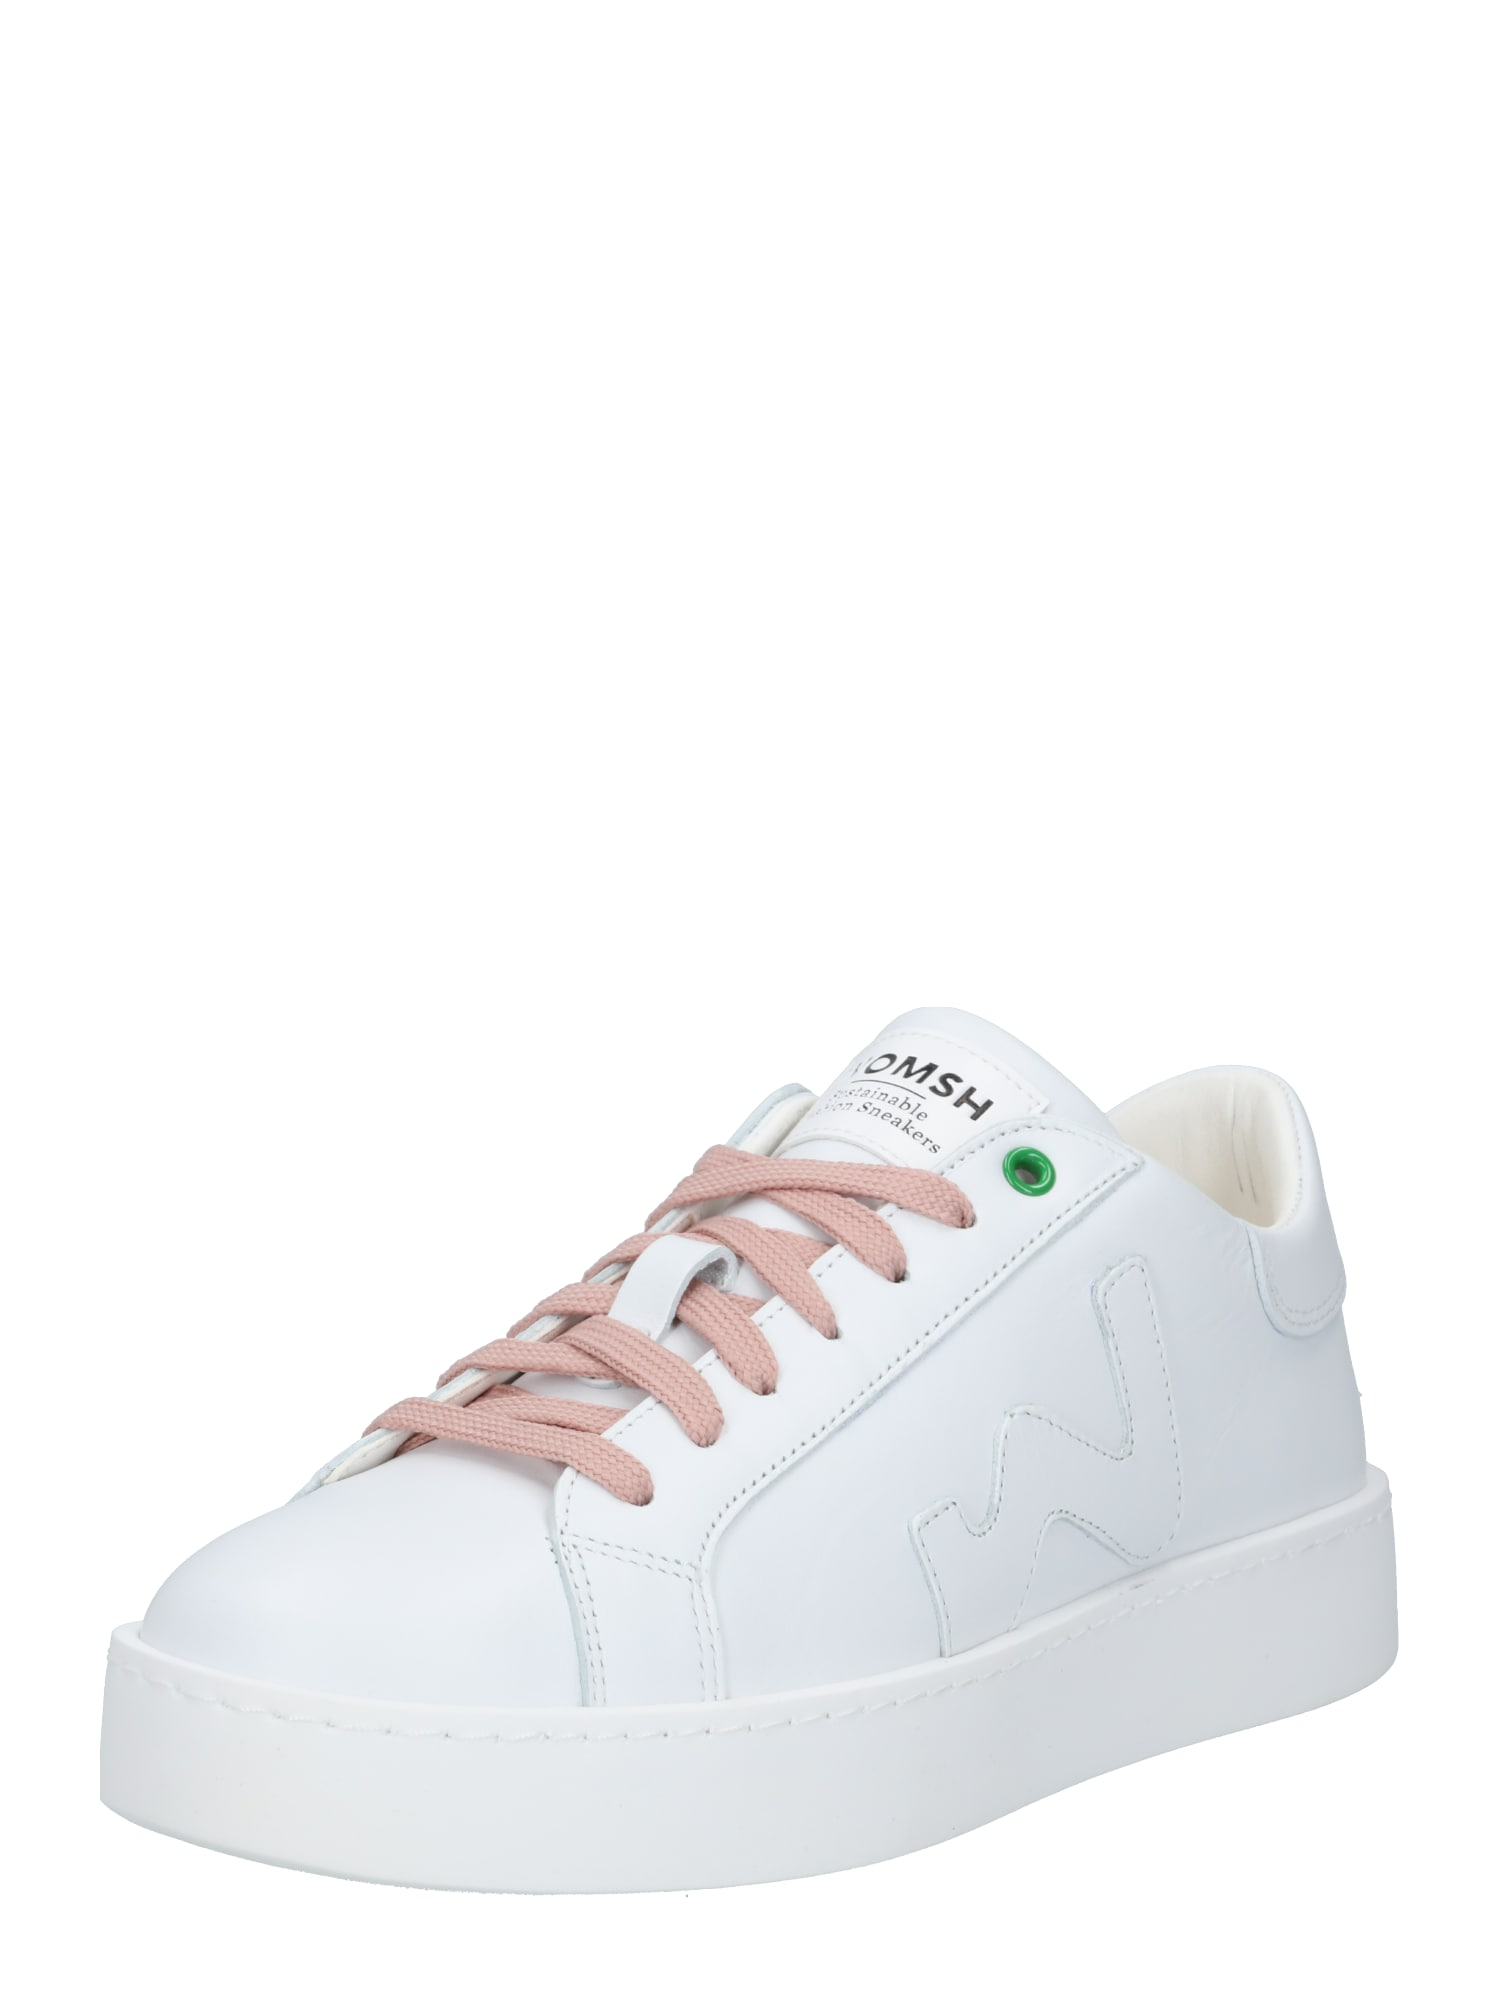 WOMSH Nízke tenisky 'Concept'  biela / rosé